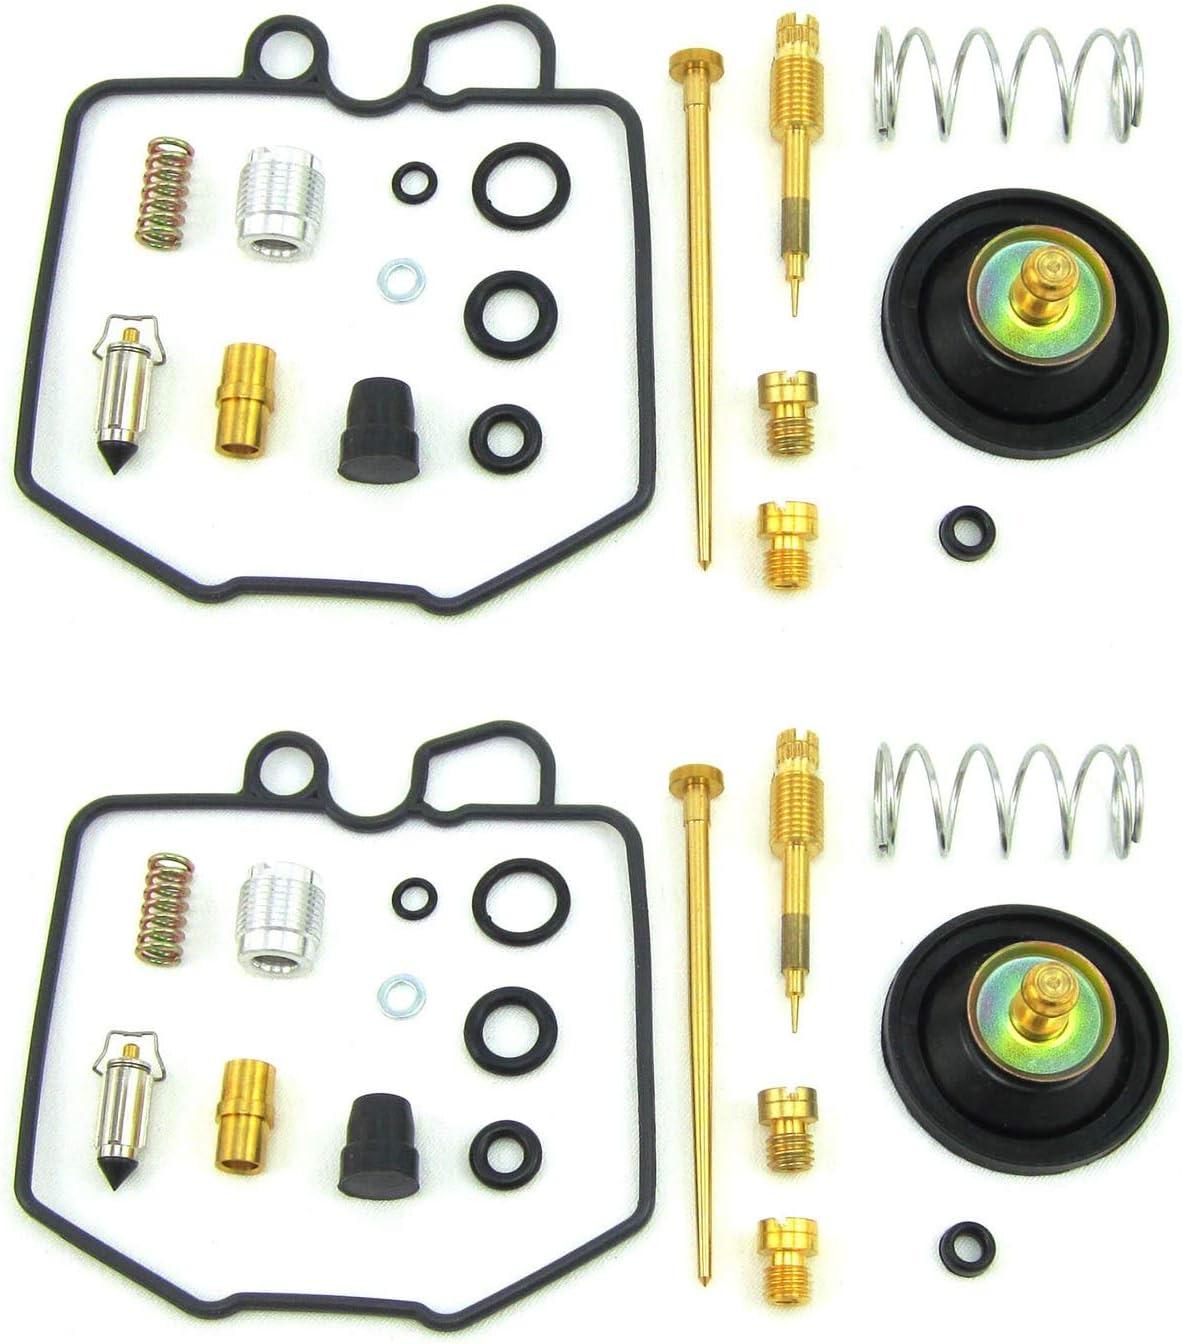 Deluxe carburetor Rebuild kit 78-79 CX500C CX500 Air Cut Off Valve Set